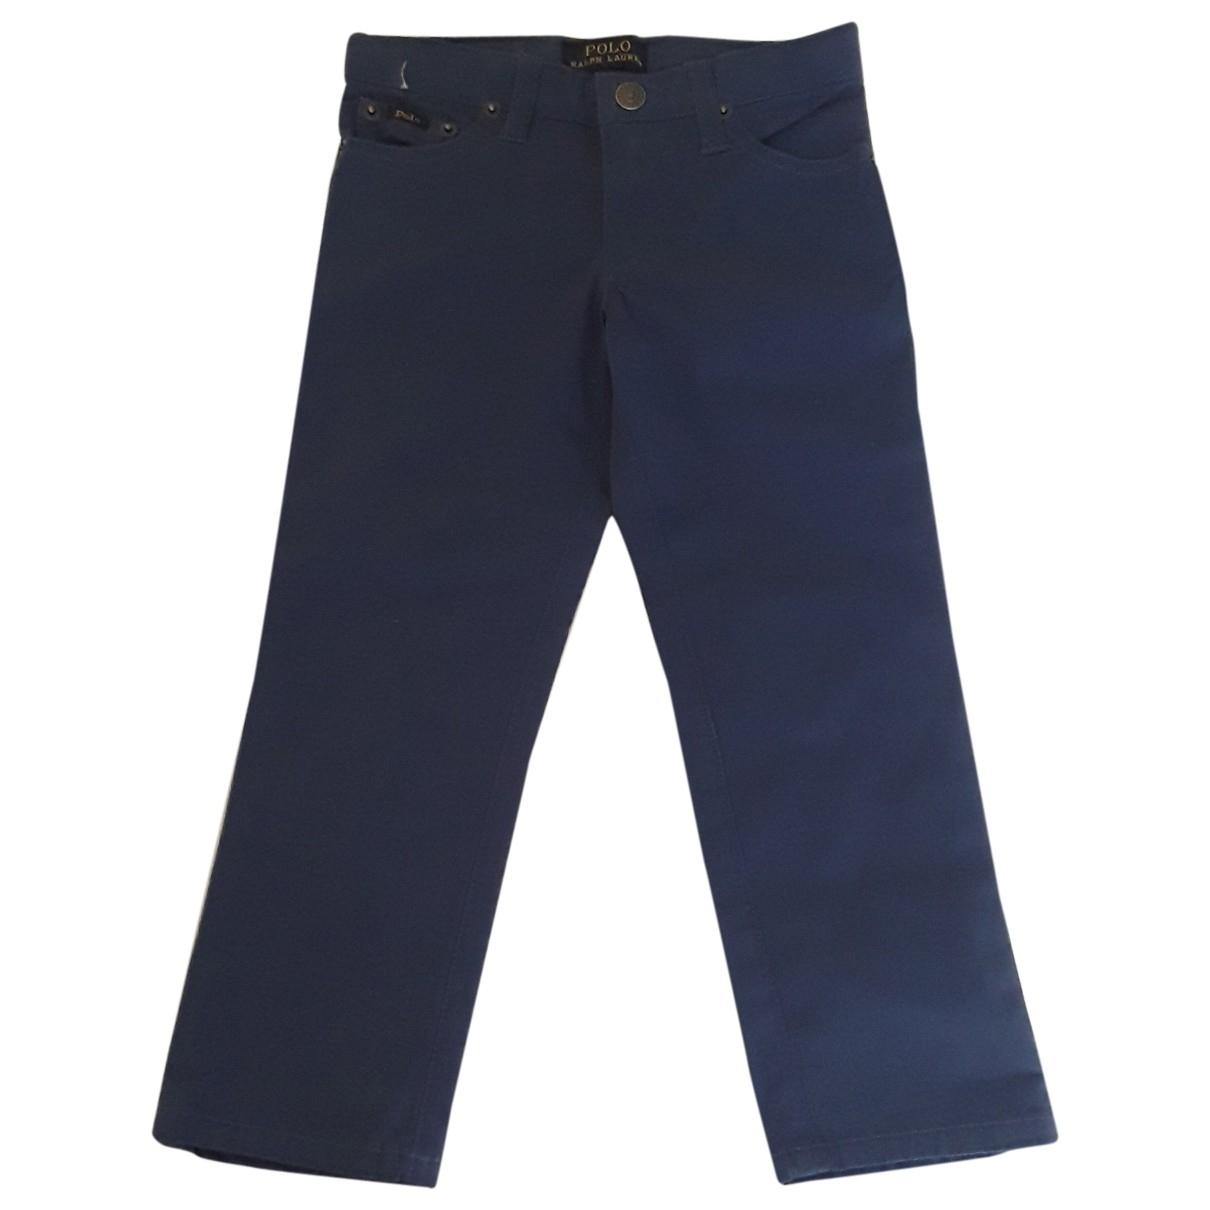 Pantalones en Algodon Polo Ralph Lauren